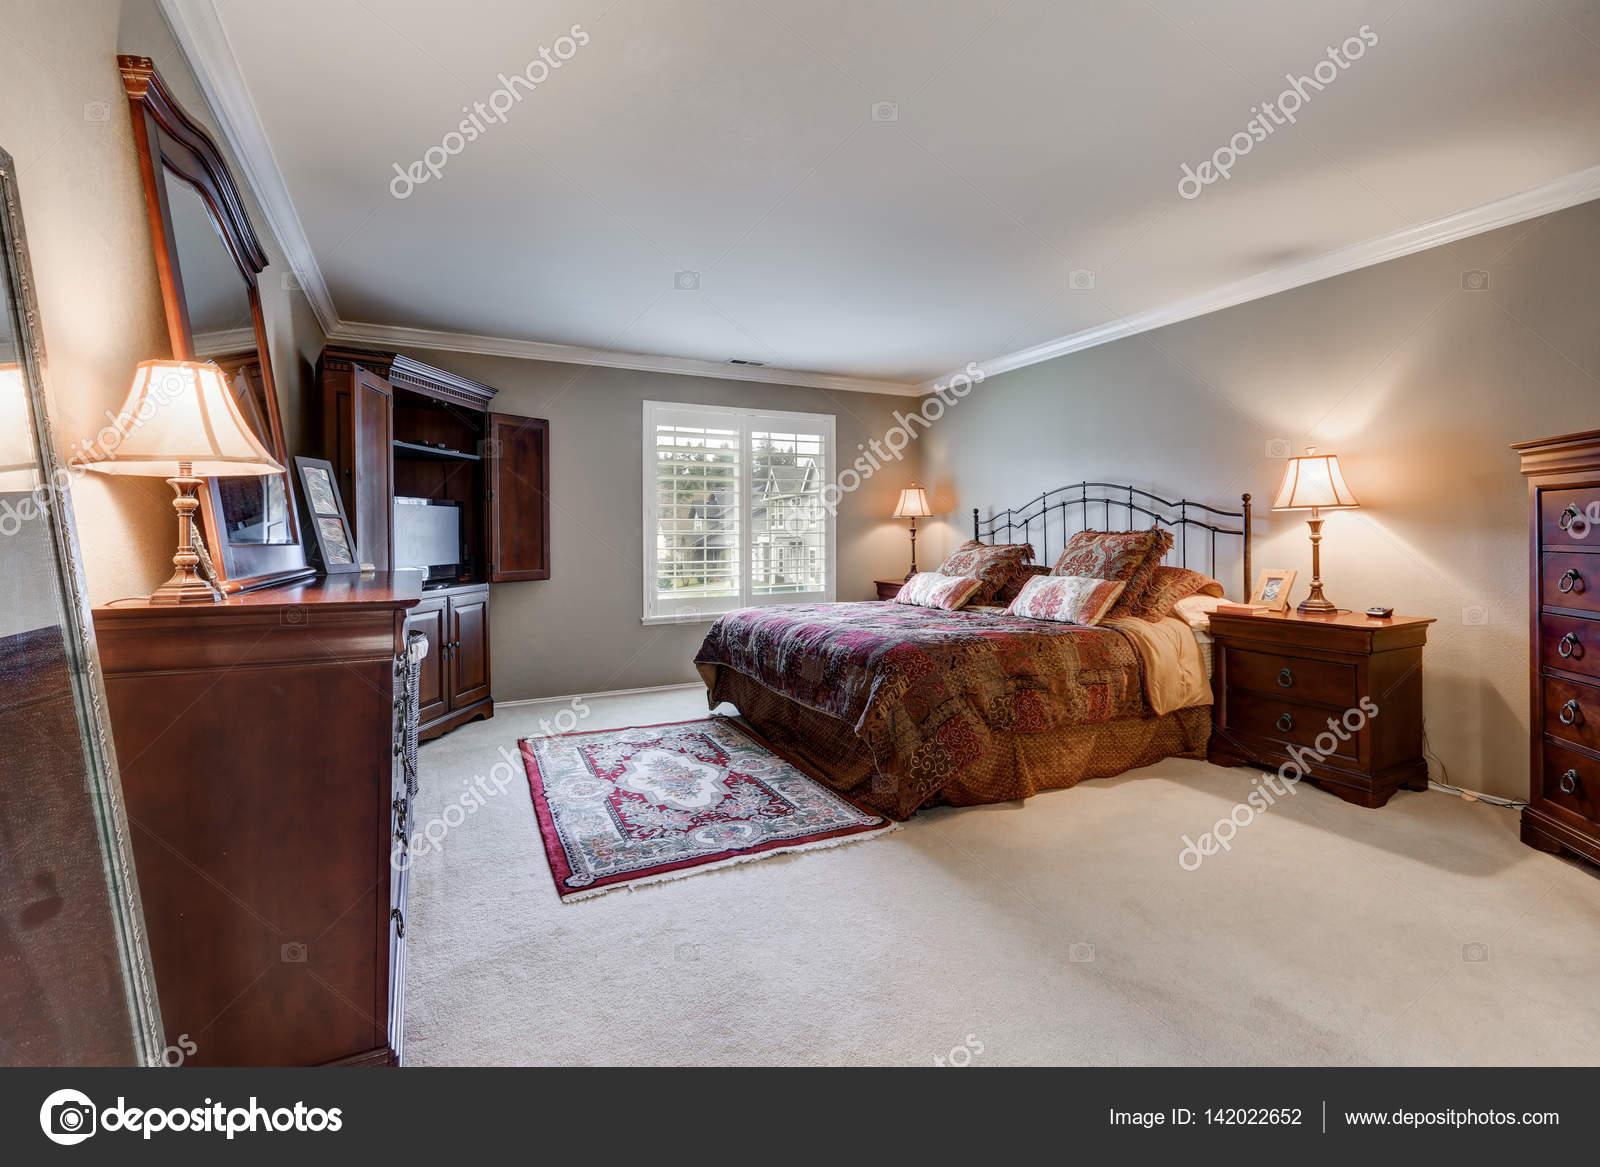 Slaapkamer Meubels Set : Slaapkamer interieur met vintage meubels set u stockfoto